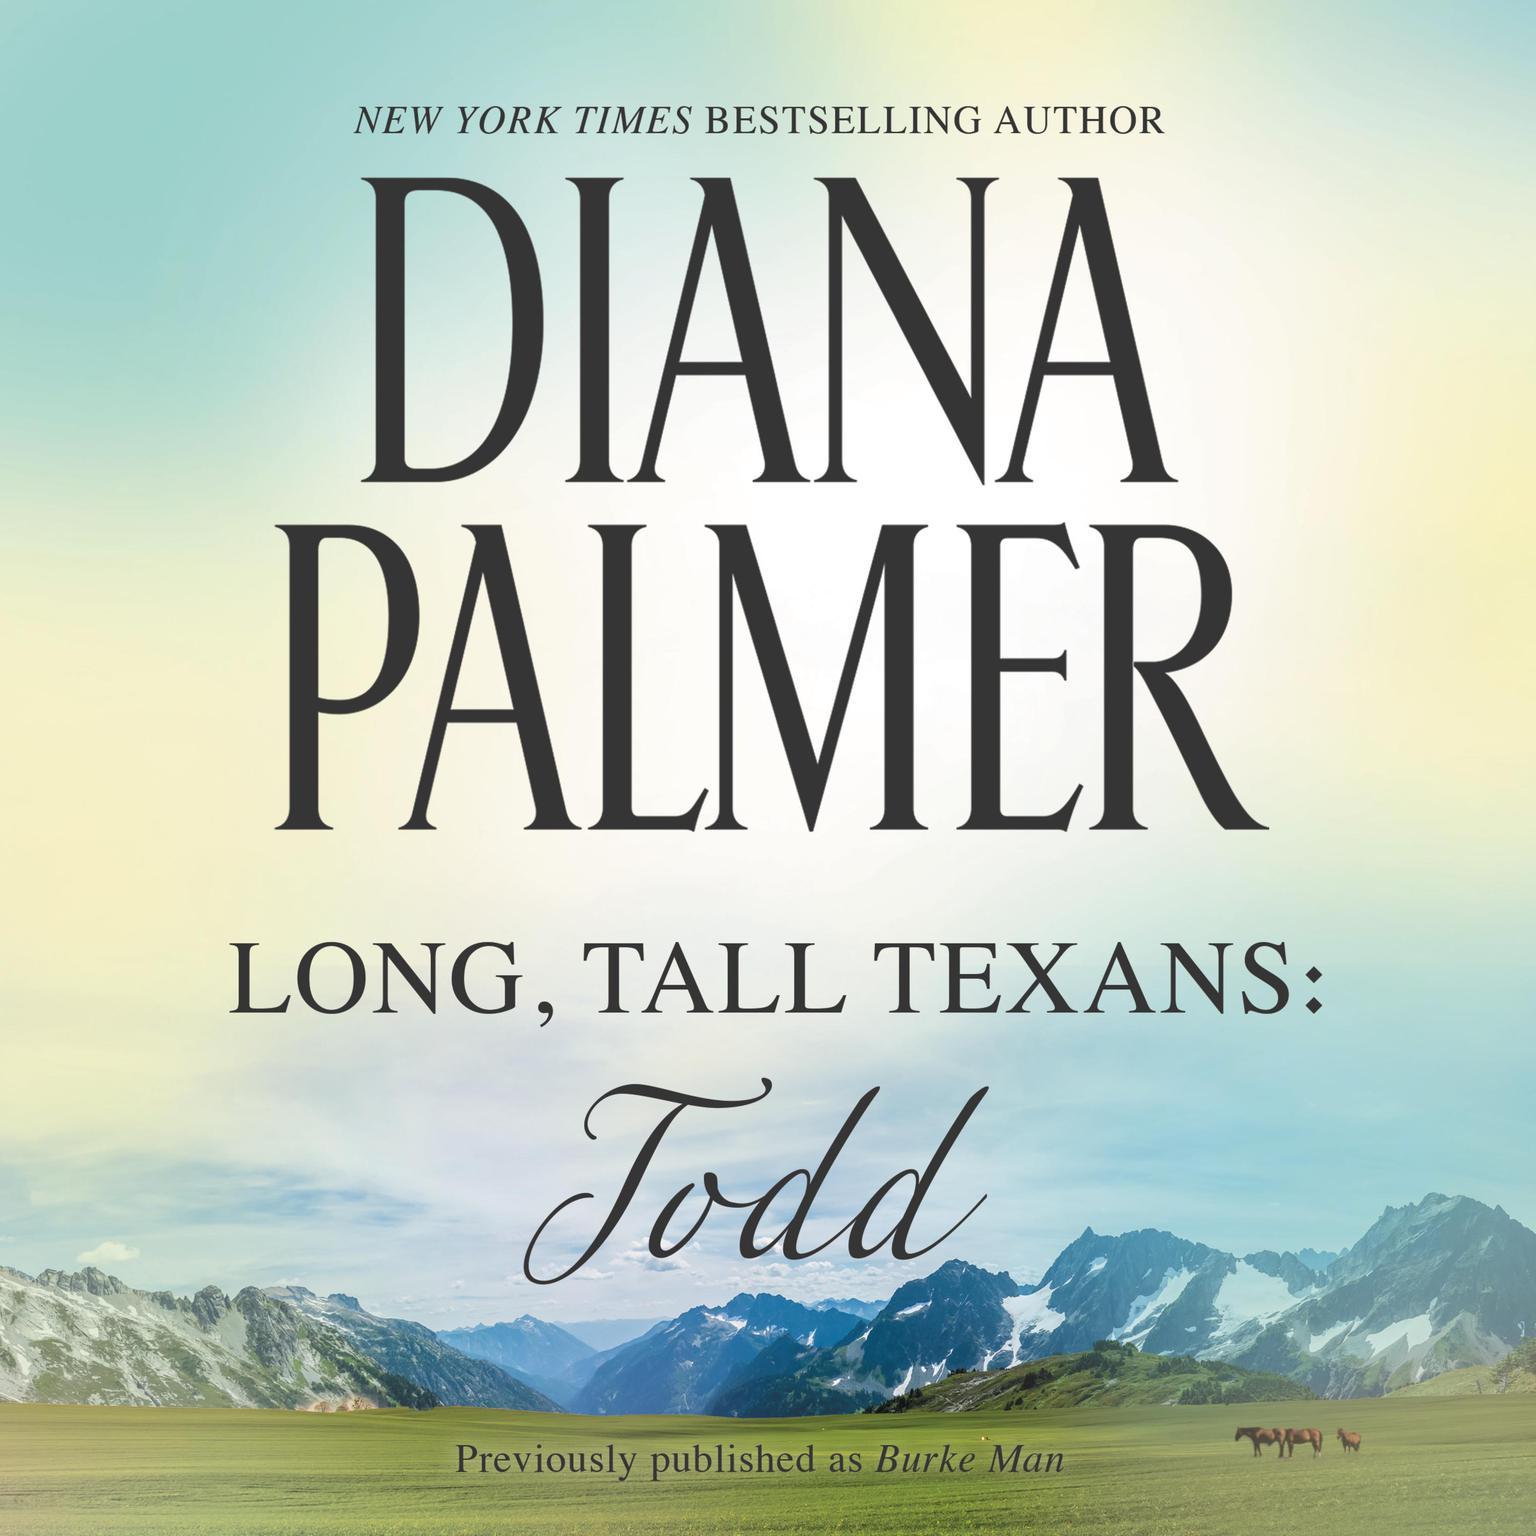 Long, Tall Texans: Todd Audiobook, by Diana Palmer